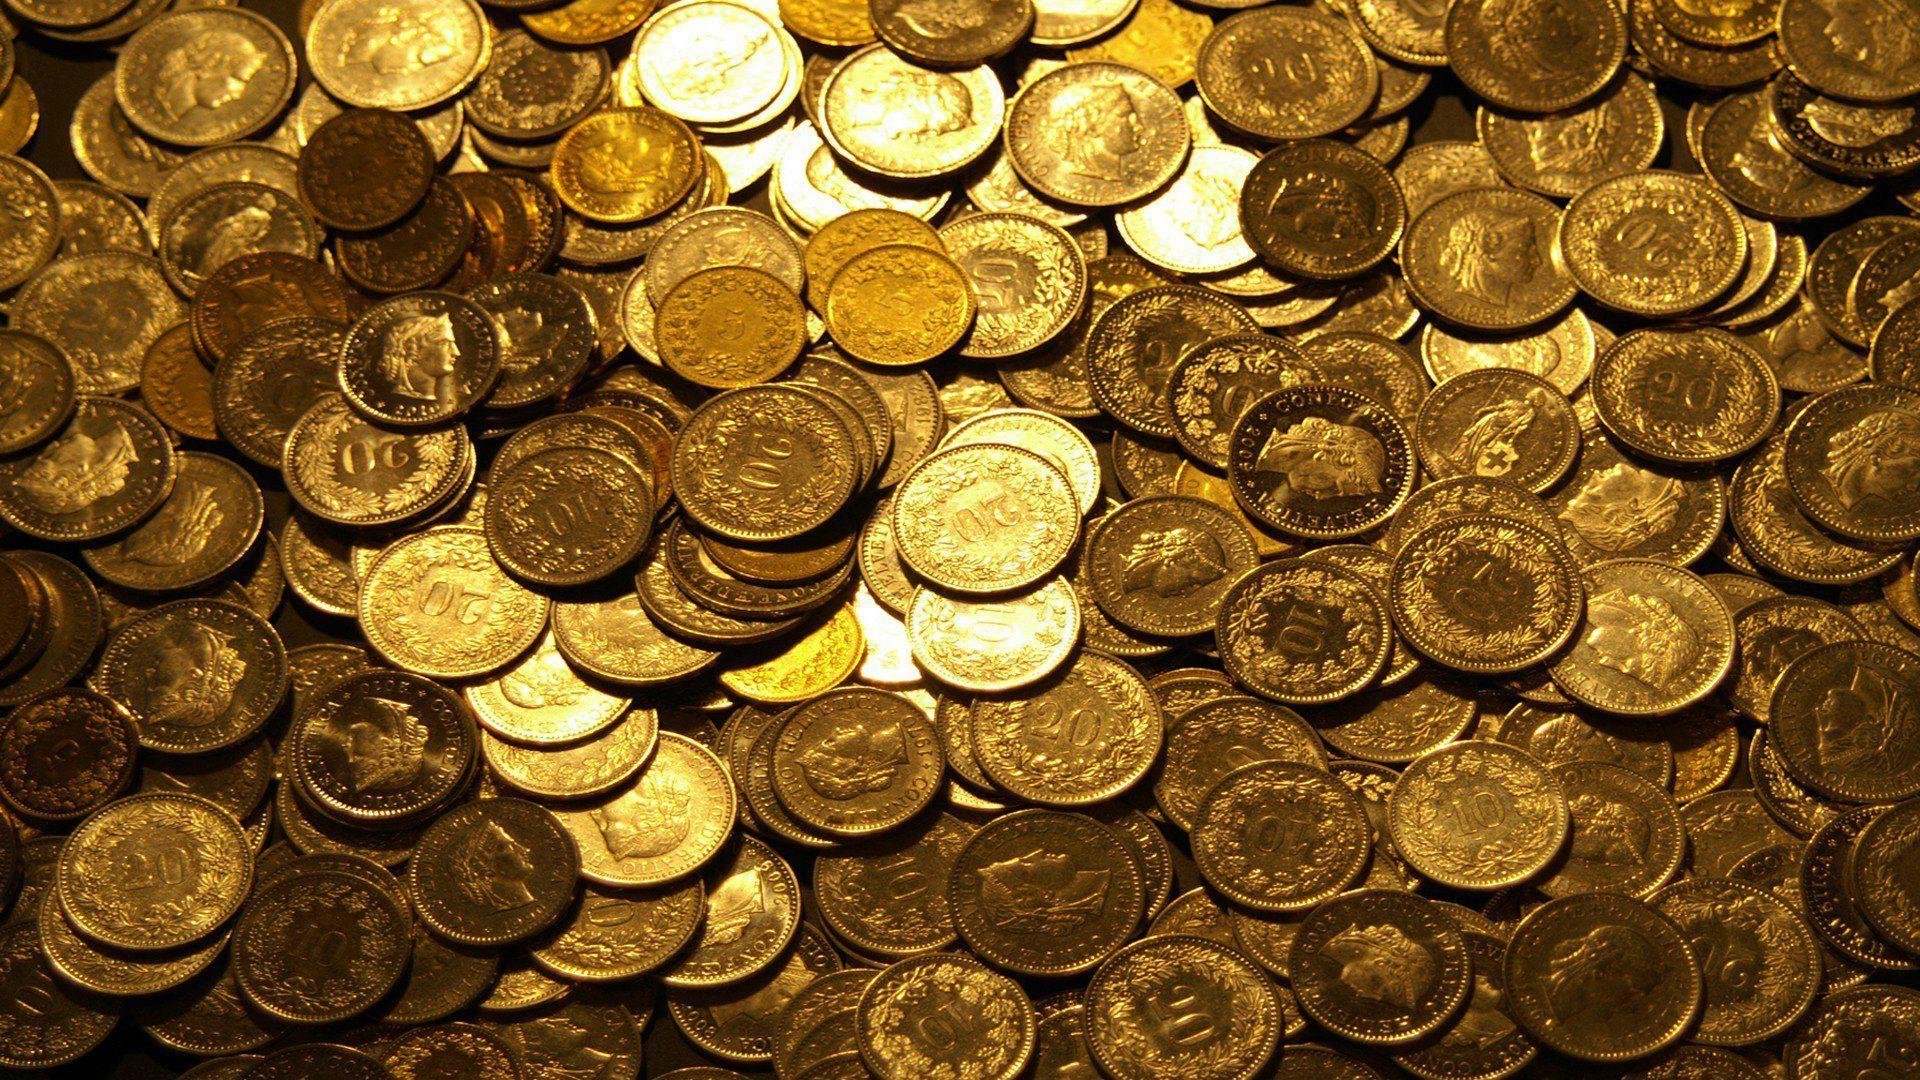 coins-money-wallpaper-computer-desktop-money